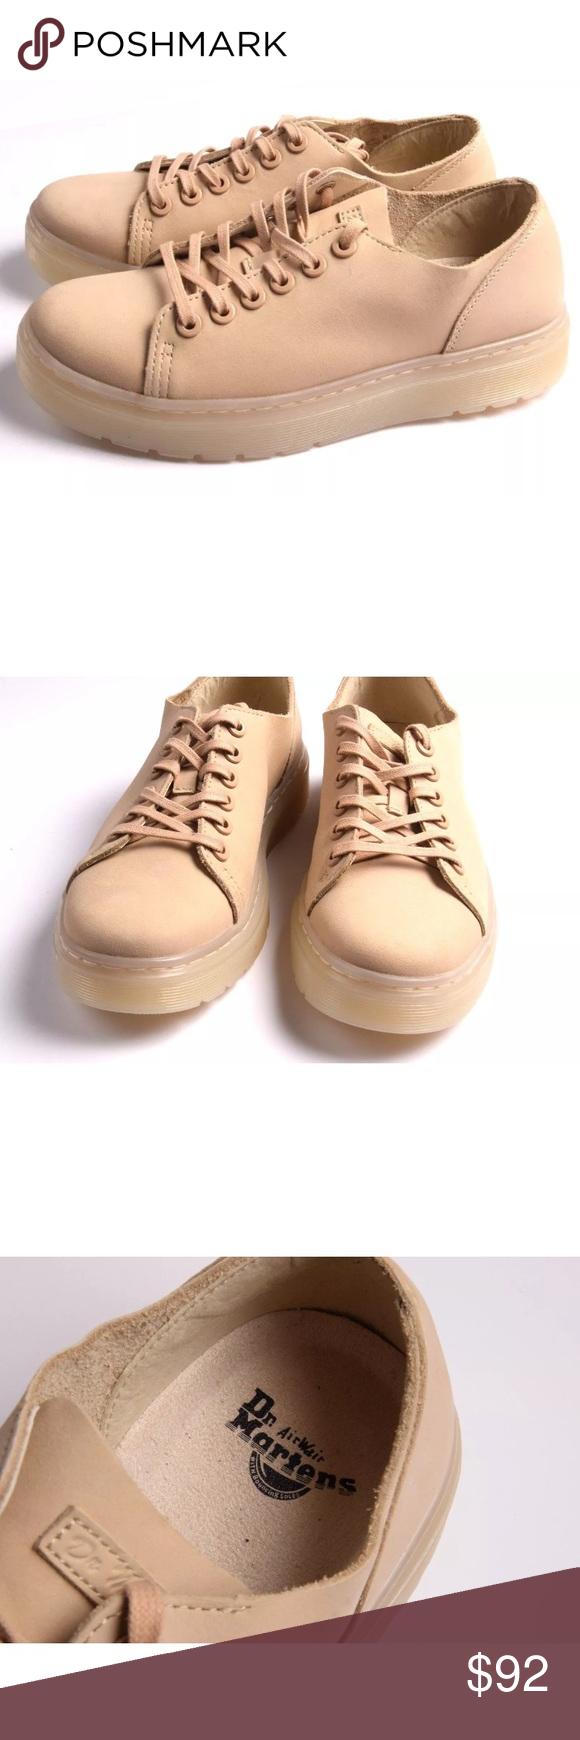 f2e4f0b6d5a Dr. Martens Airwair Suede Platform Sand Sneaker Dr. Martens Airwair Suede  Platform Sneaker Nude